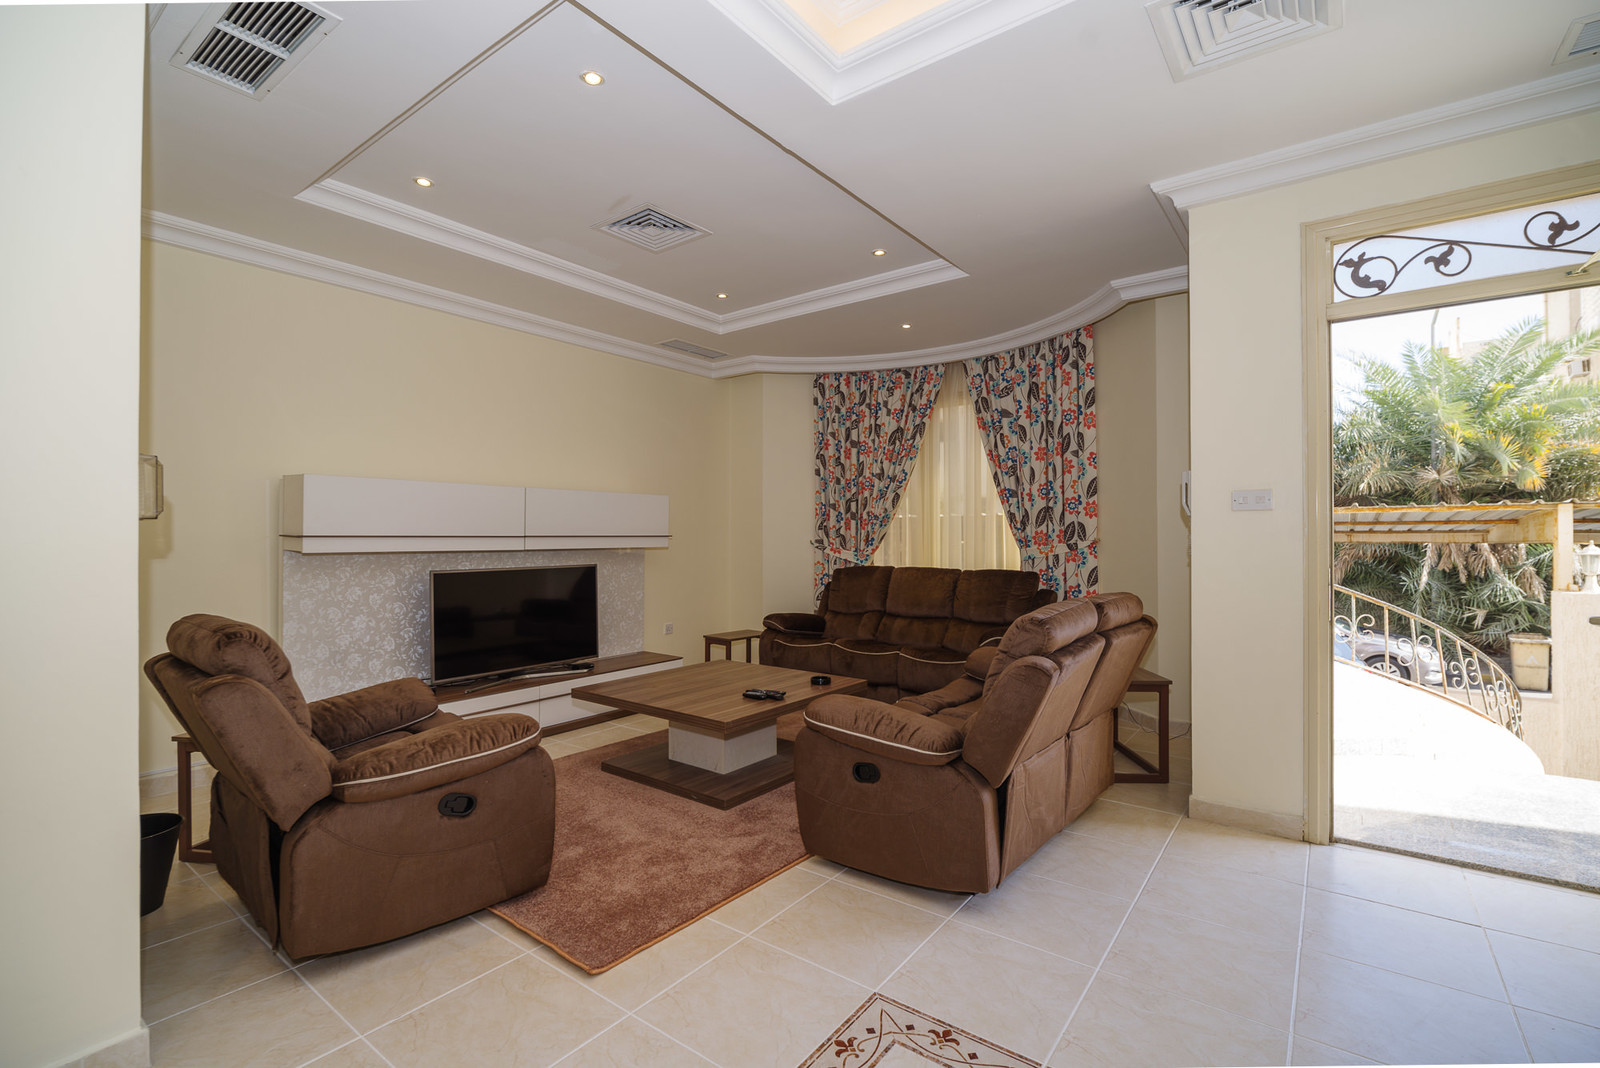 Salwa – fully furnished, three bedroom apartment